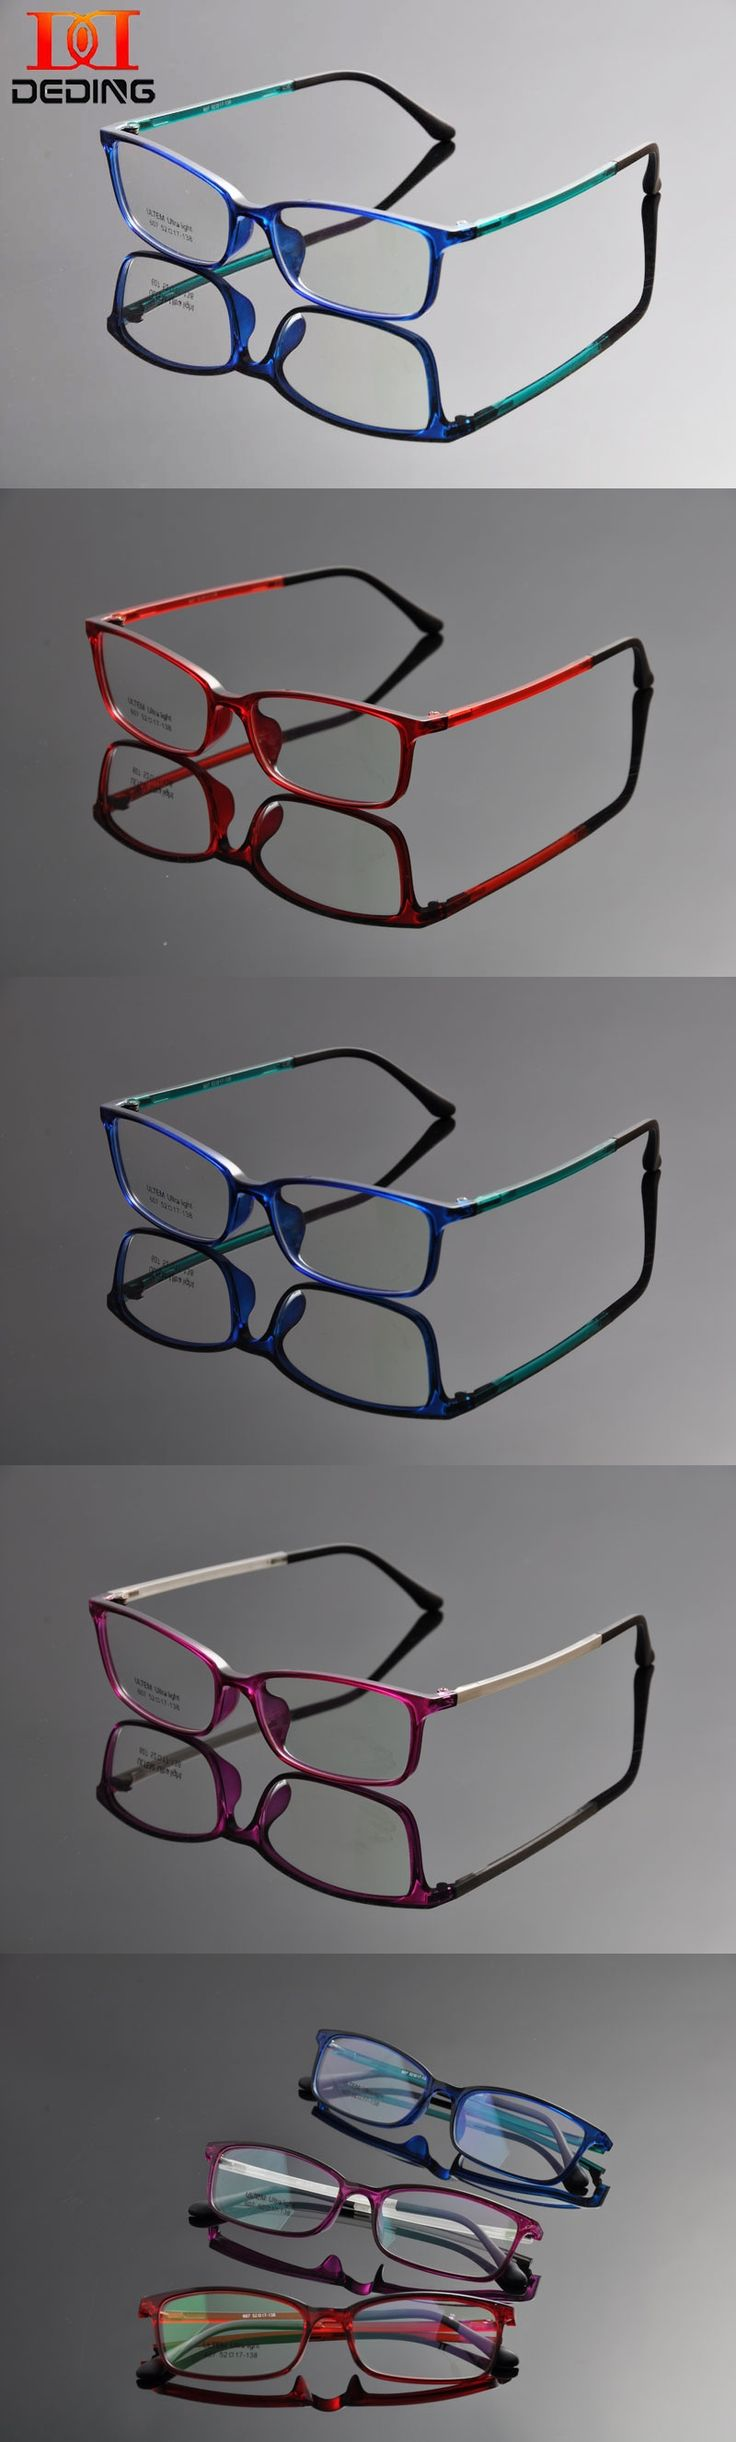 DEDING Retro Wayfare Clear Lens Glasses Casual Fashion Horned Rim Rectangular Frame Eye Glasses monturas de lentes Mujer DD1345